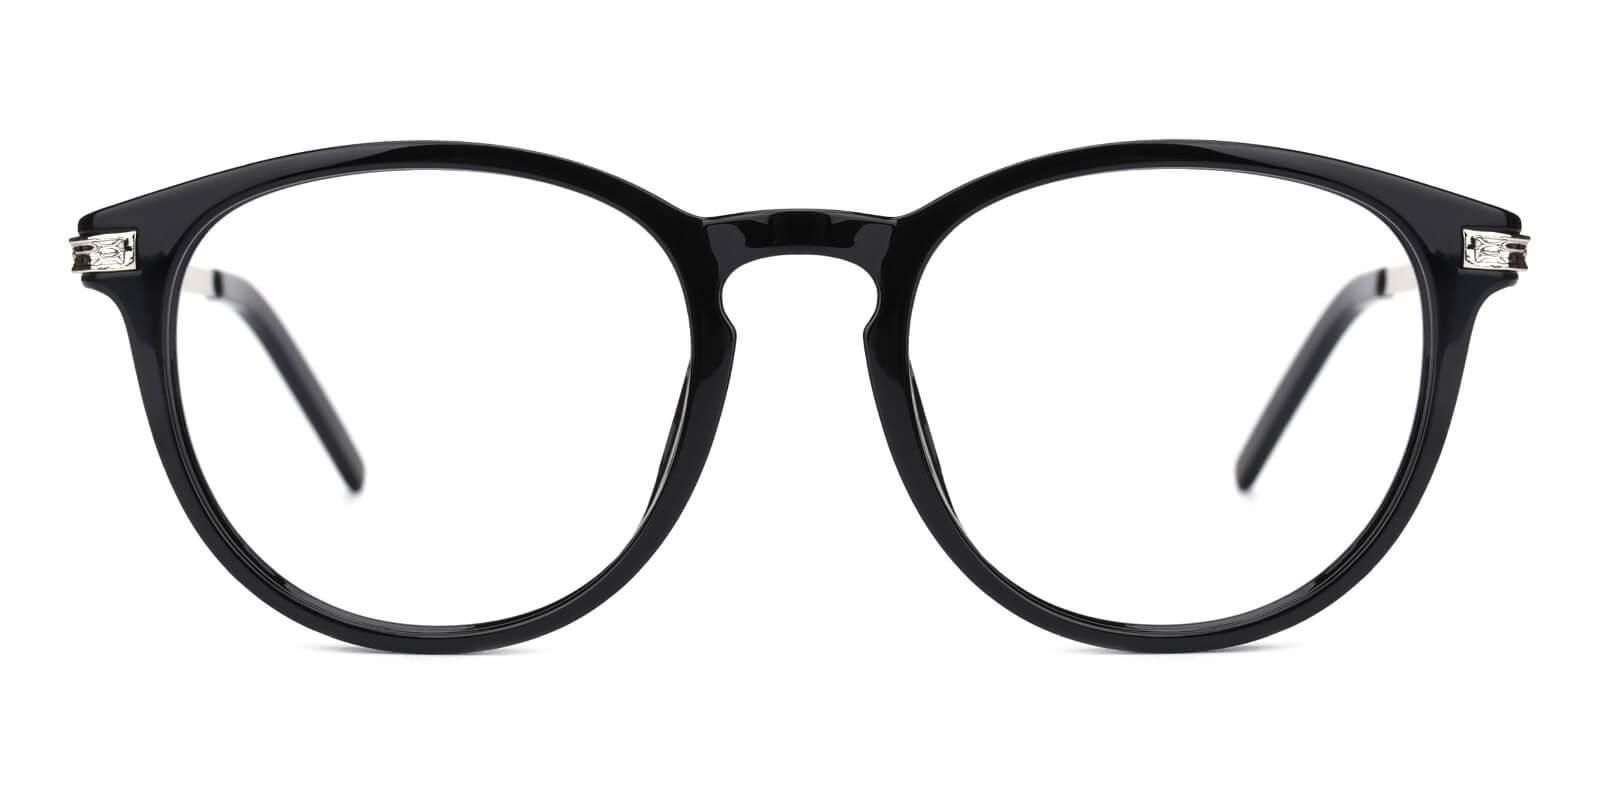 Gambia-Black-Round-Combination-Eyeglasses-additional2